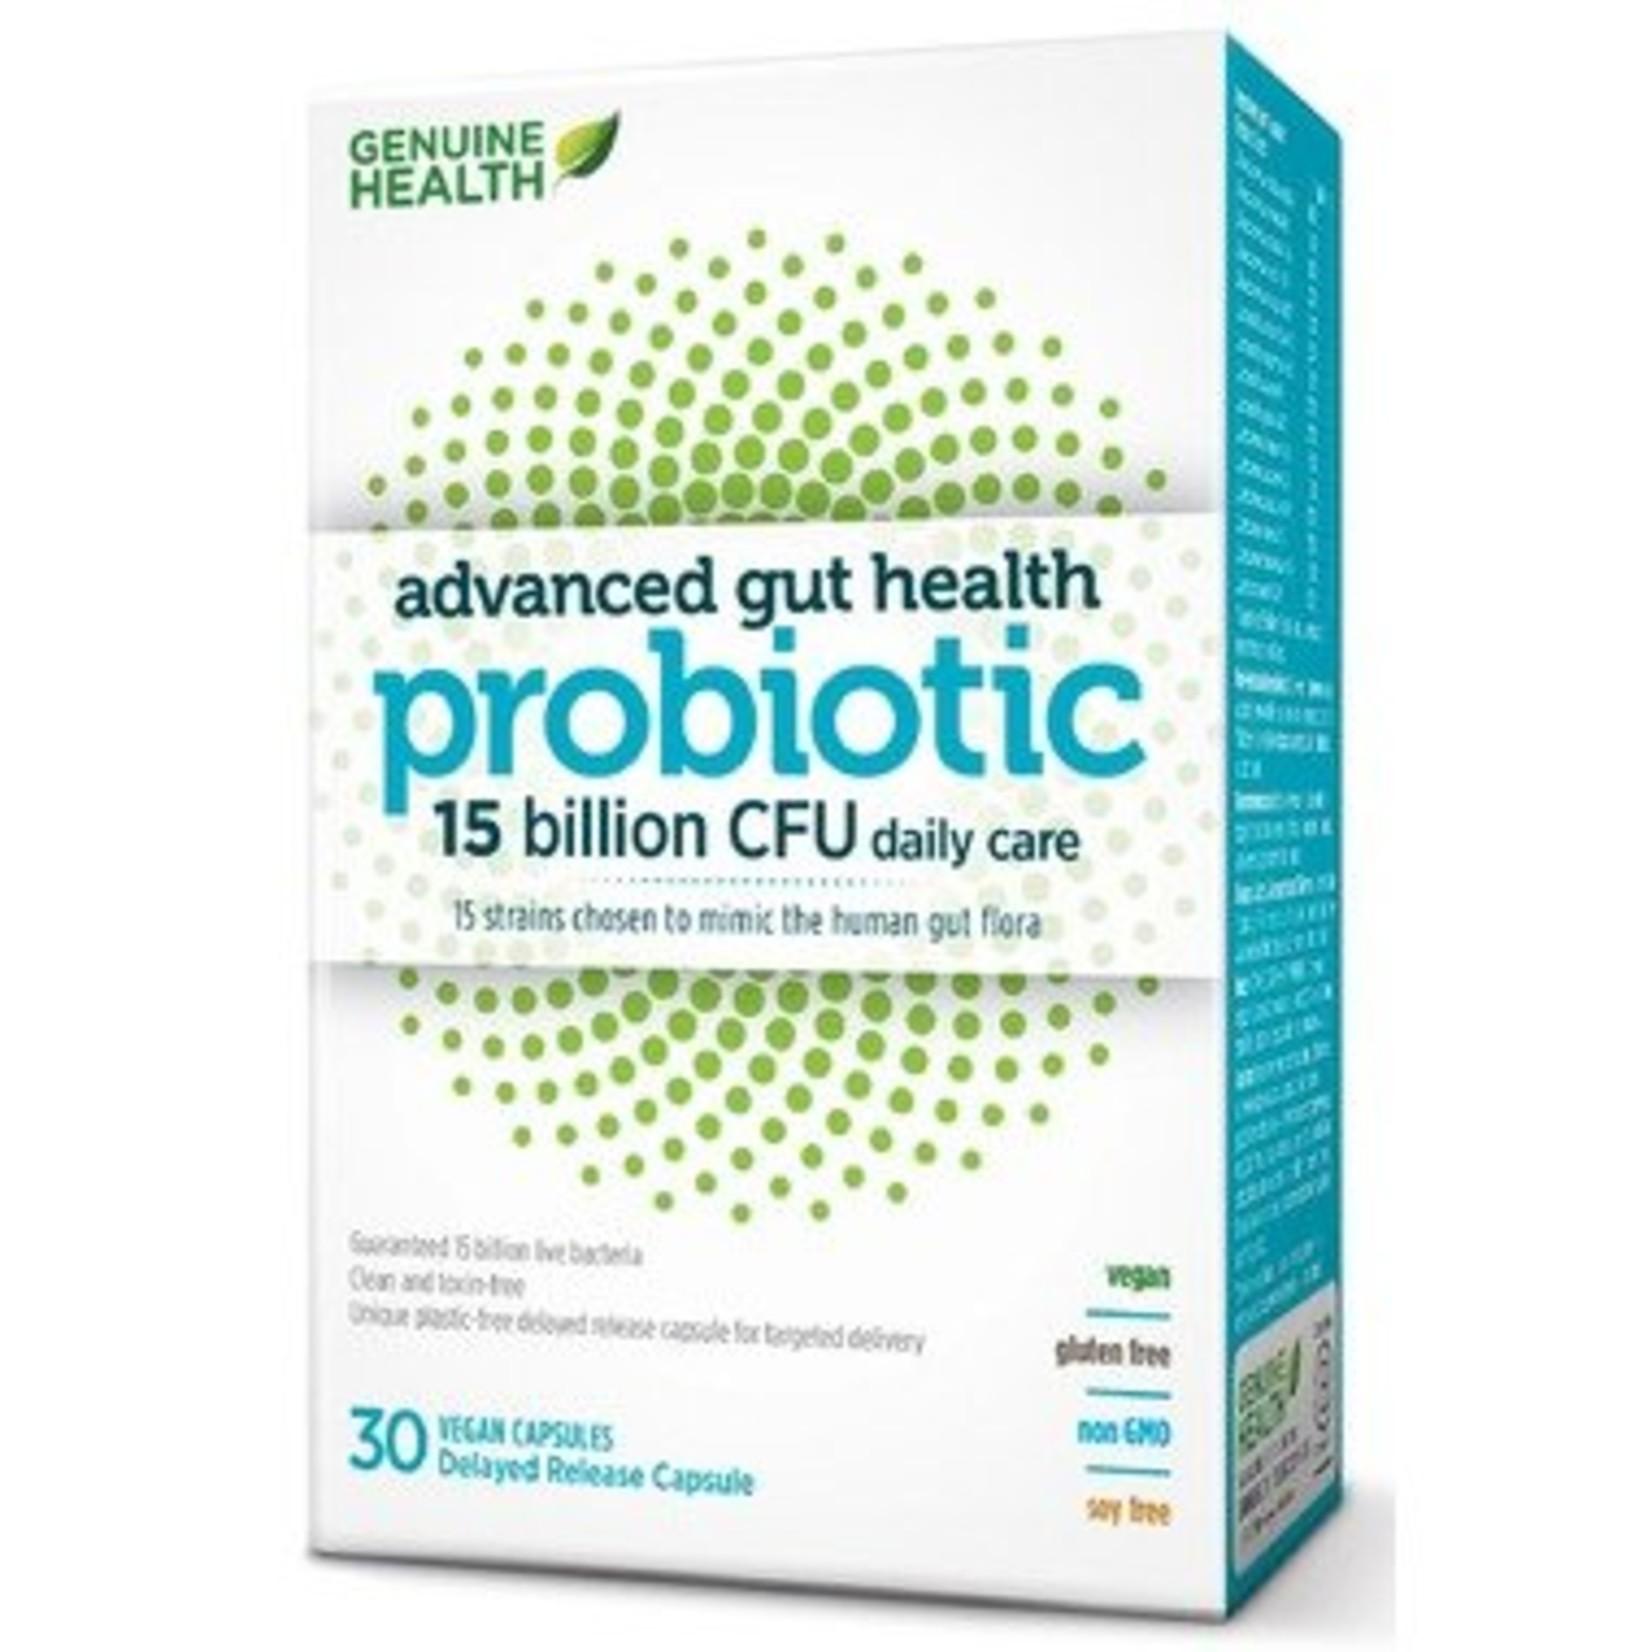 Genuine Health Genuine Health Advanced Gut Probiotic 15 billion 30 caps